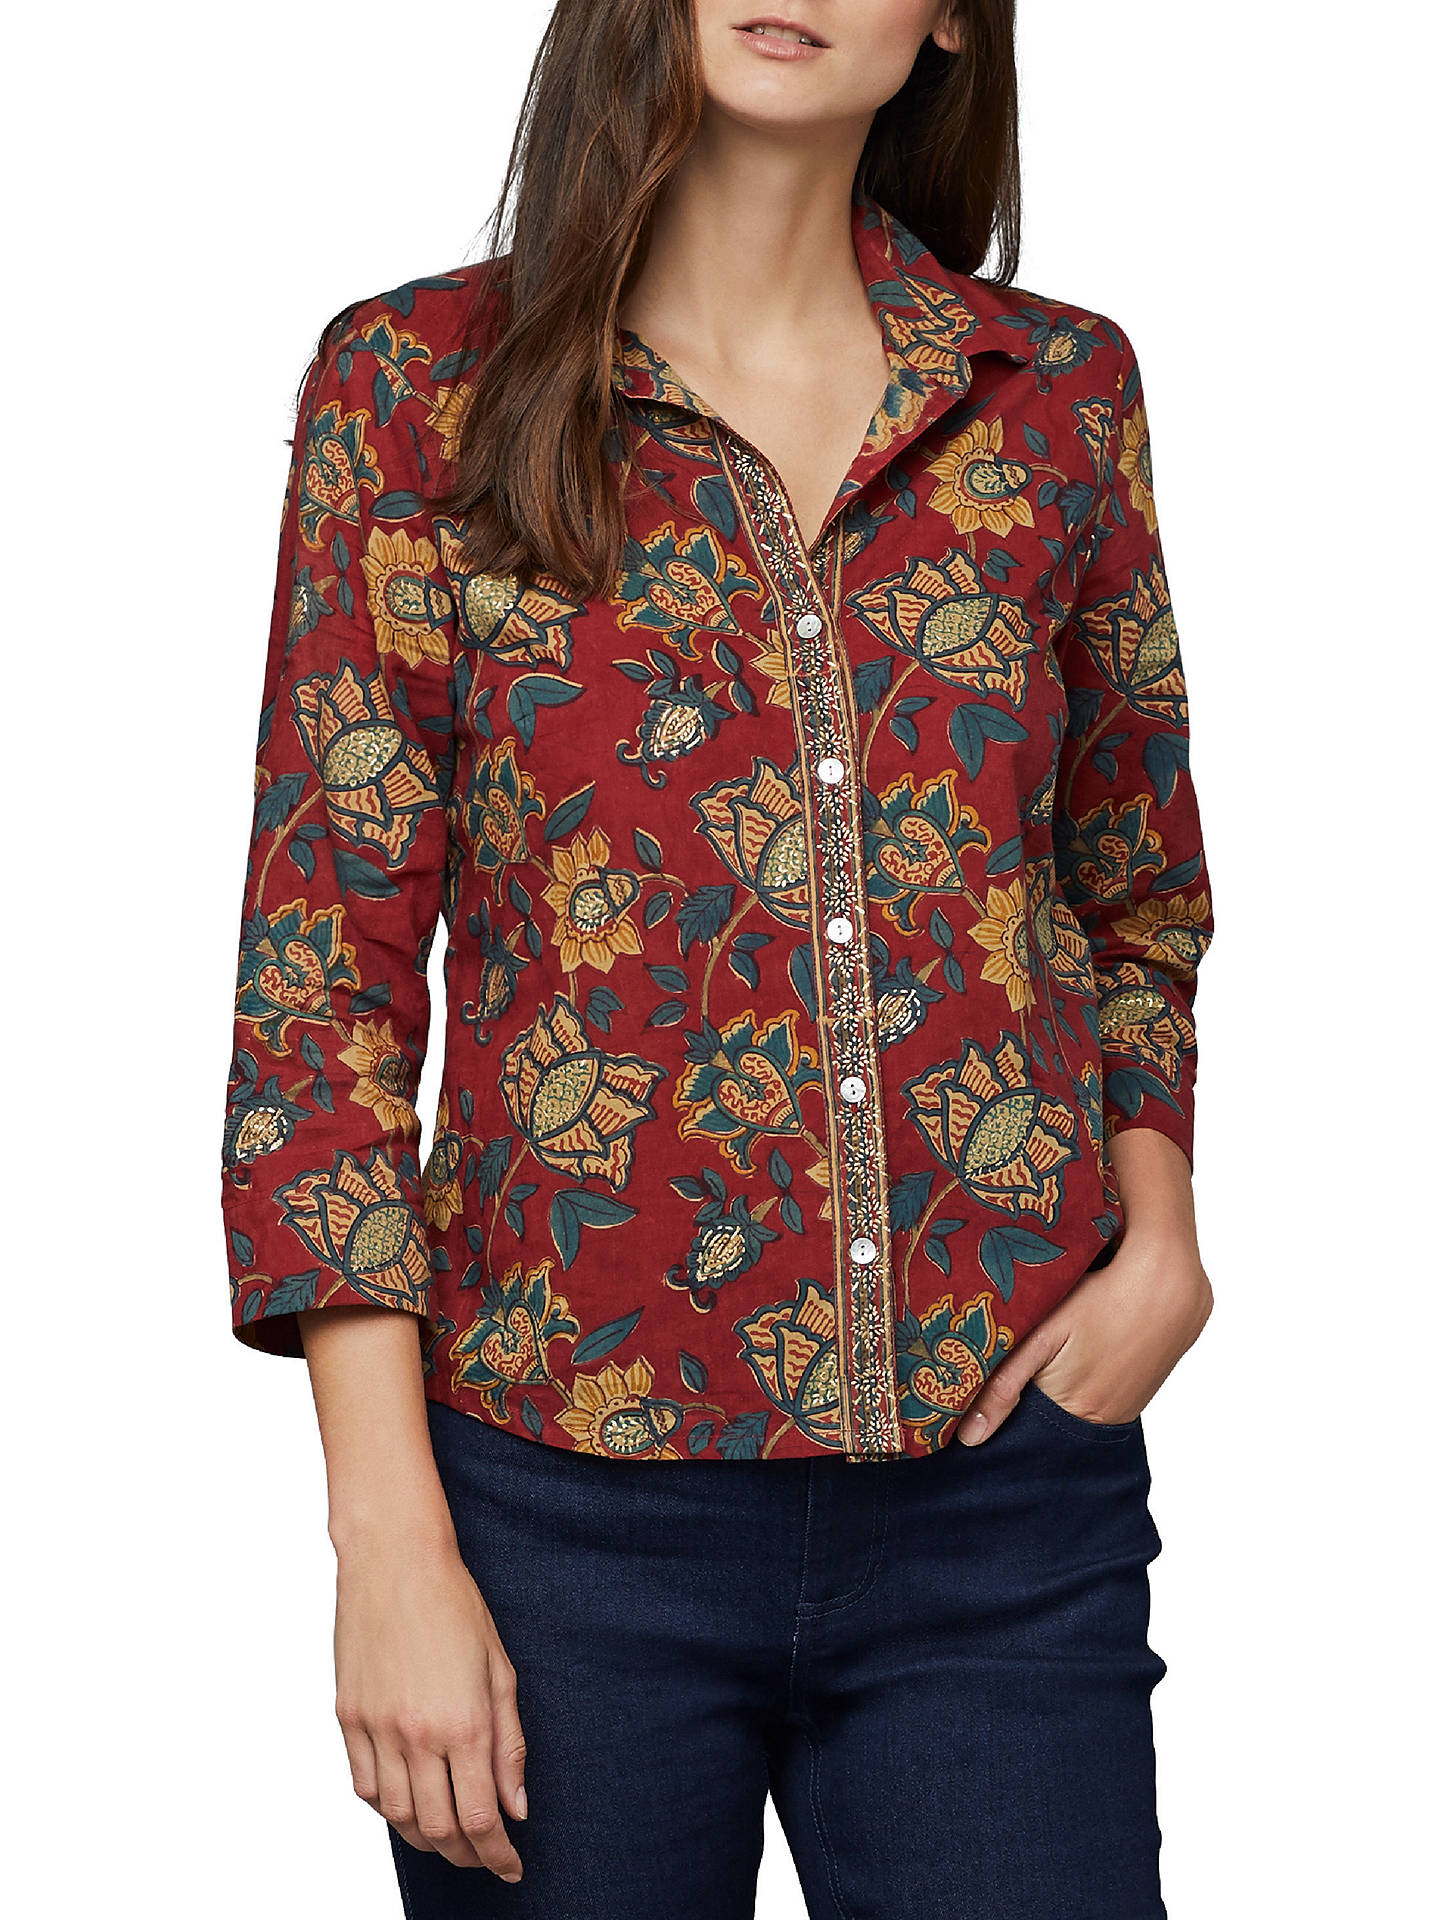 cbc486cb434 Buy East Anokhi Shirin Print Shirt, Red/Multi, 10 Online at johnlewis.